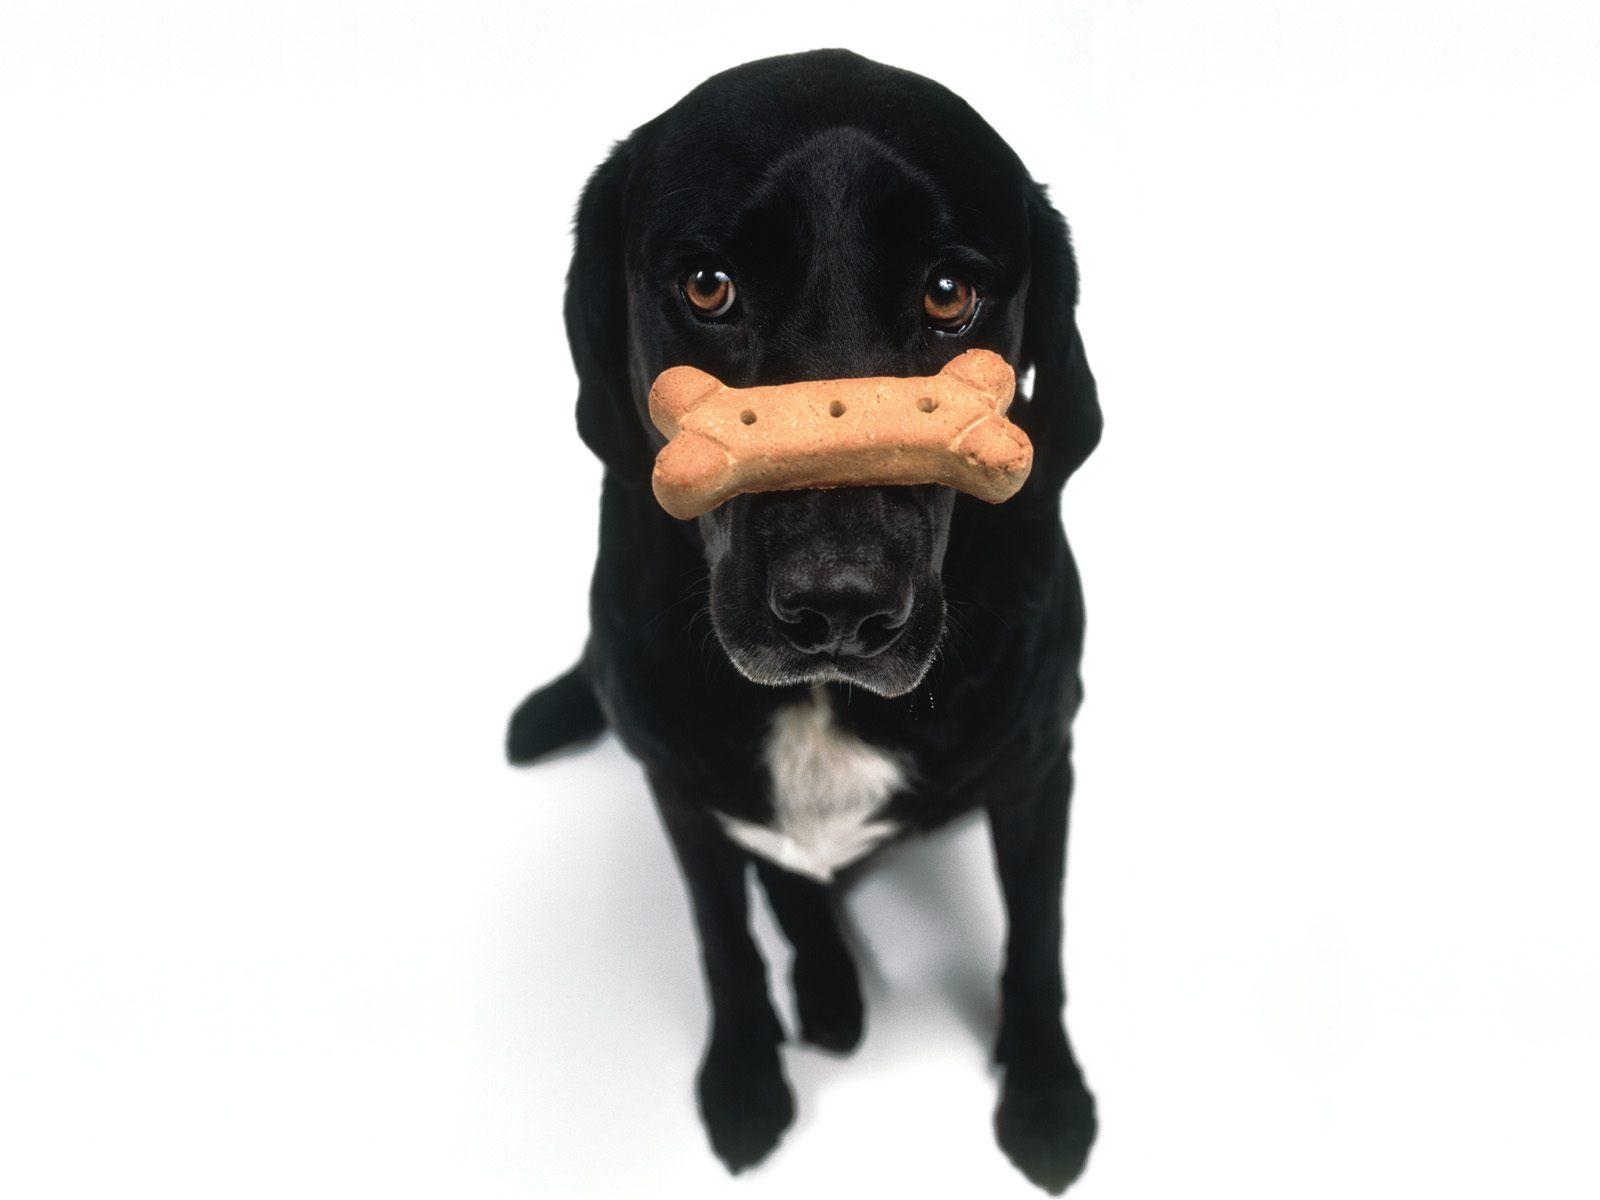 http://2.bp.blogspot.com/-F_gRi7efPEU/Tut7TnliVKI/AAAAAAAAHCQ/rj3bmUooKKA/s1600/black_dog-normal.jpg